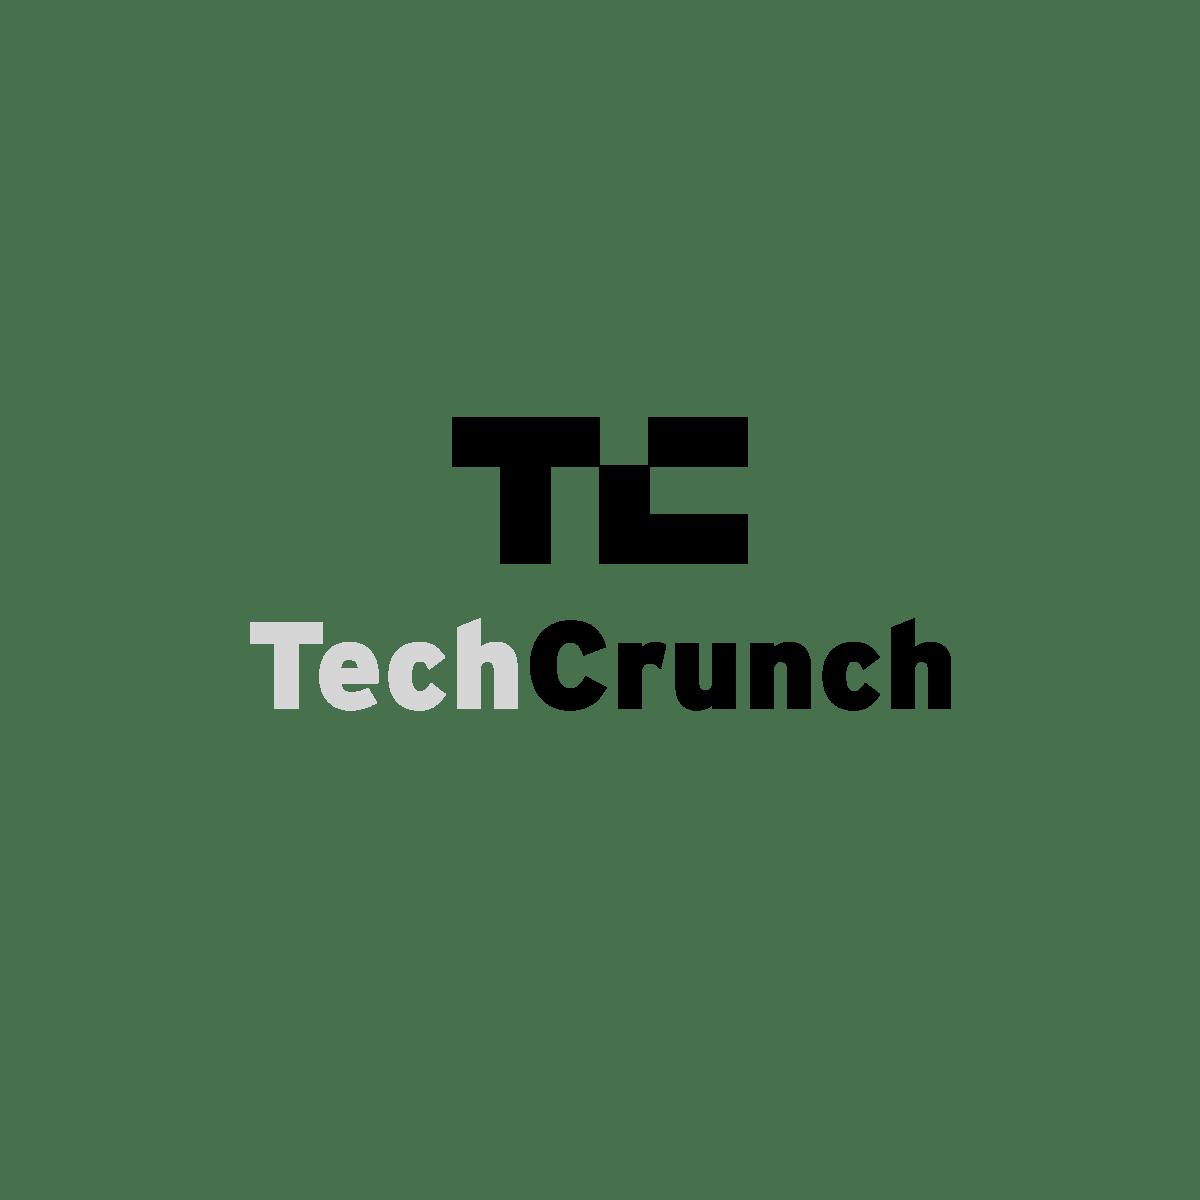 TechCrunch Gray Vertical